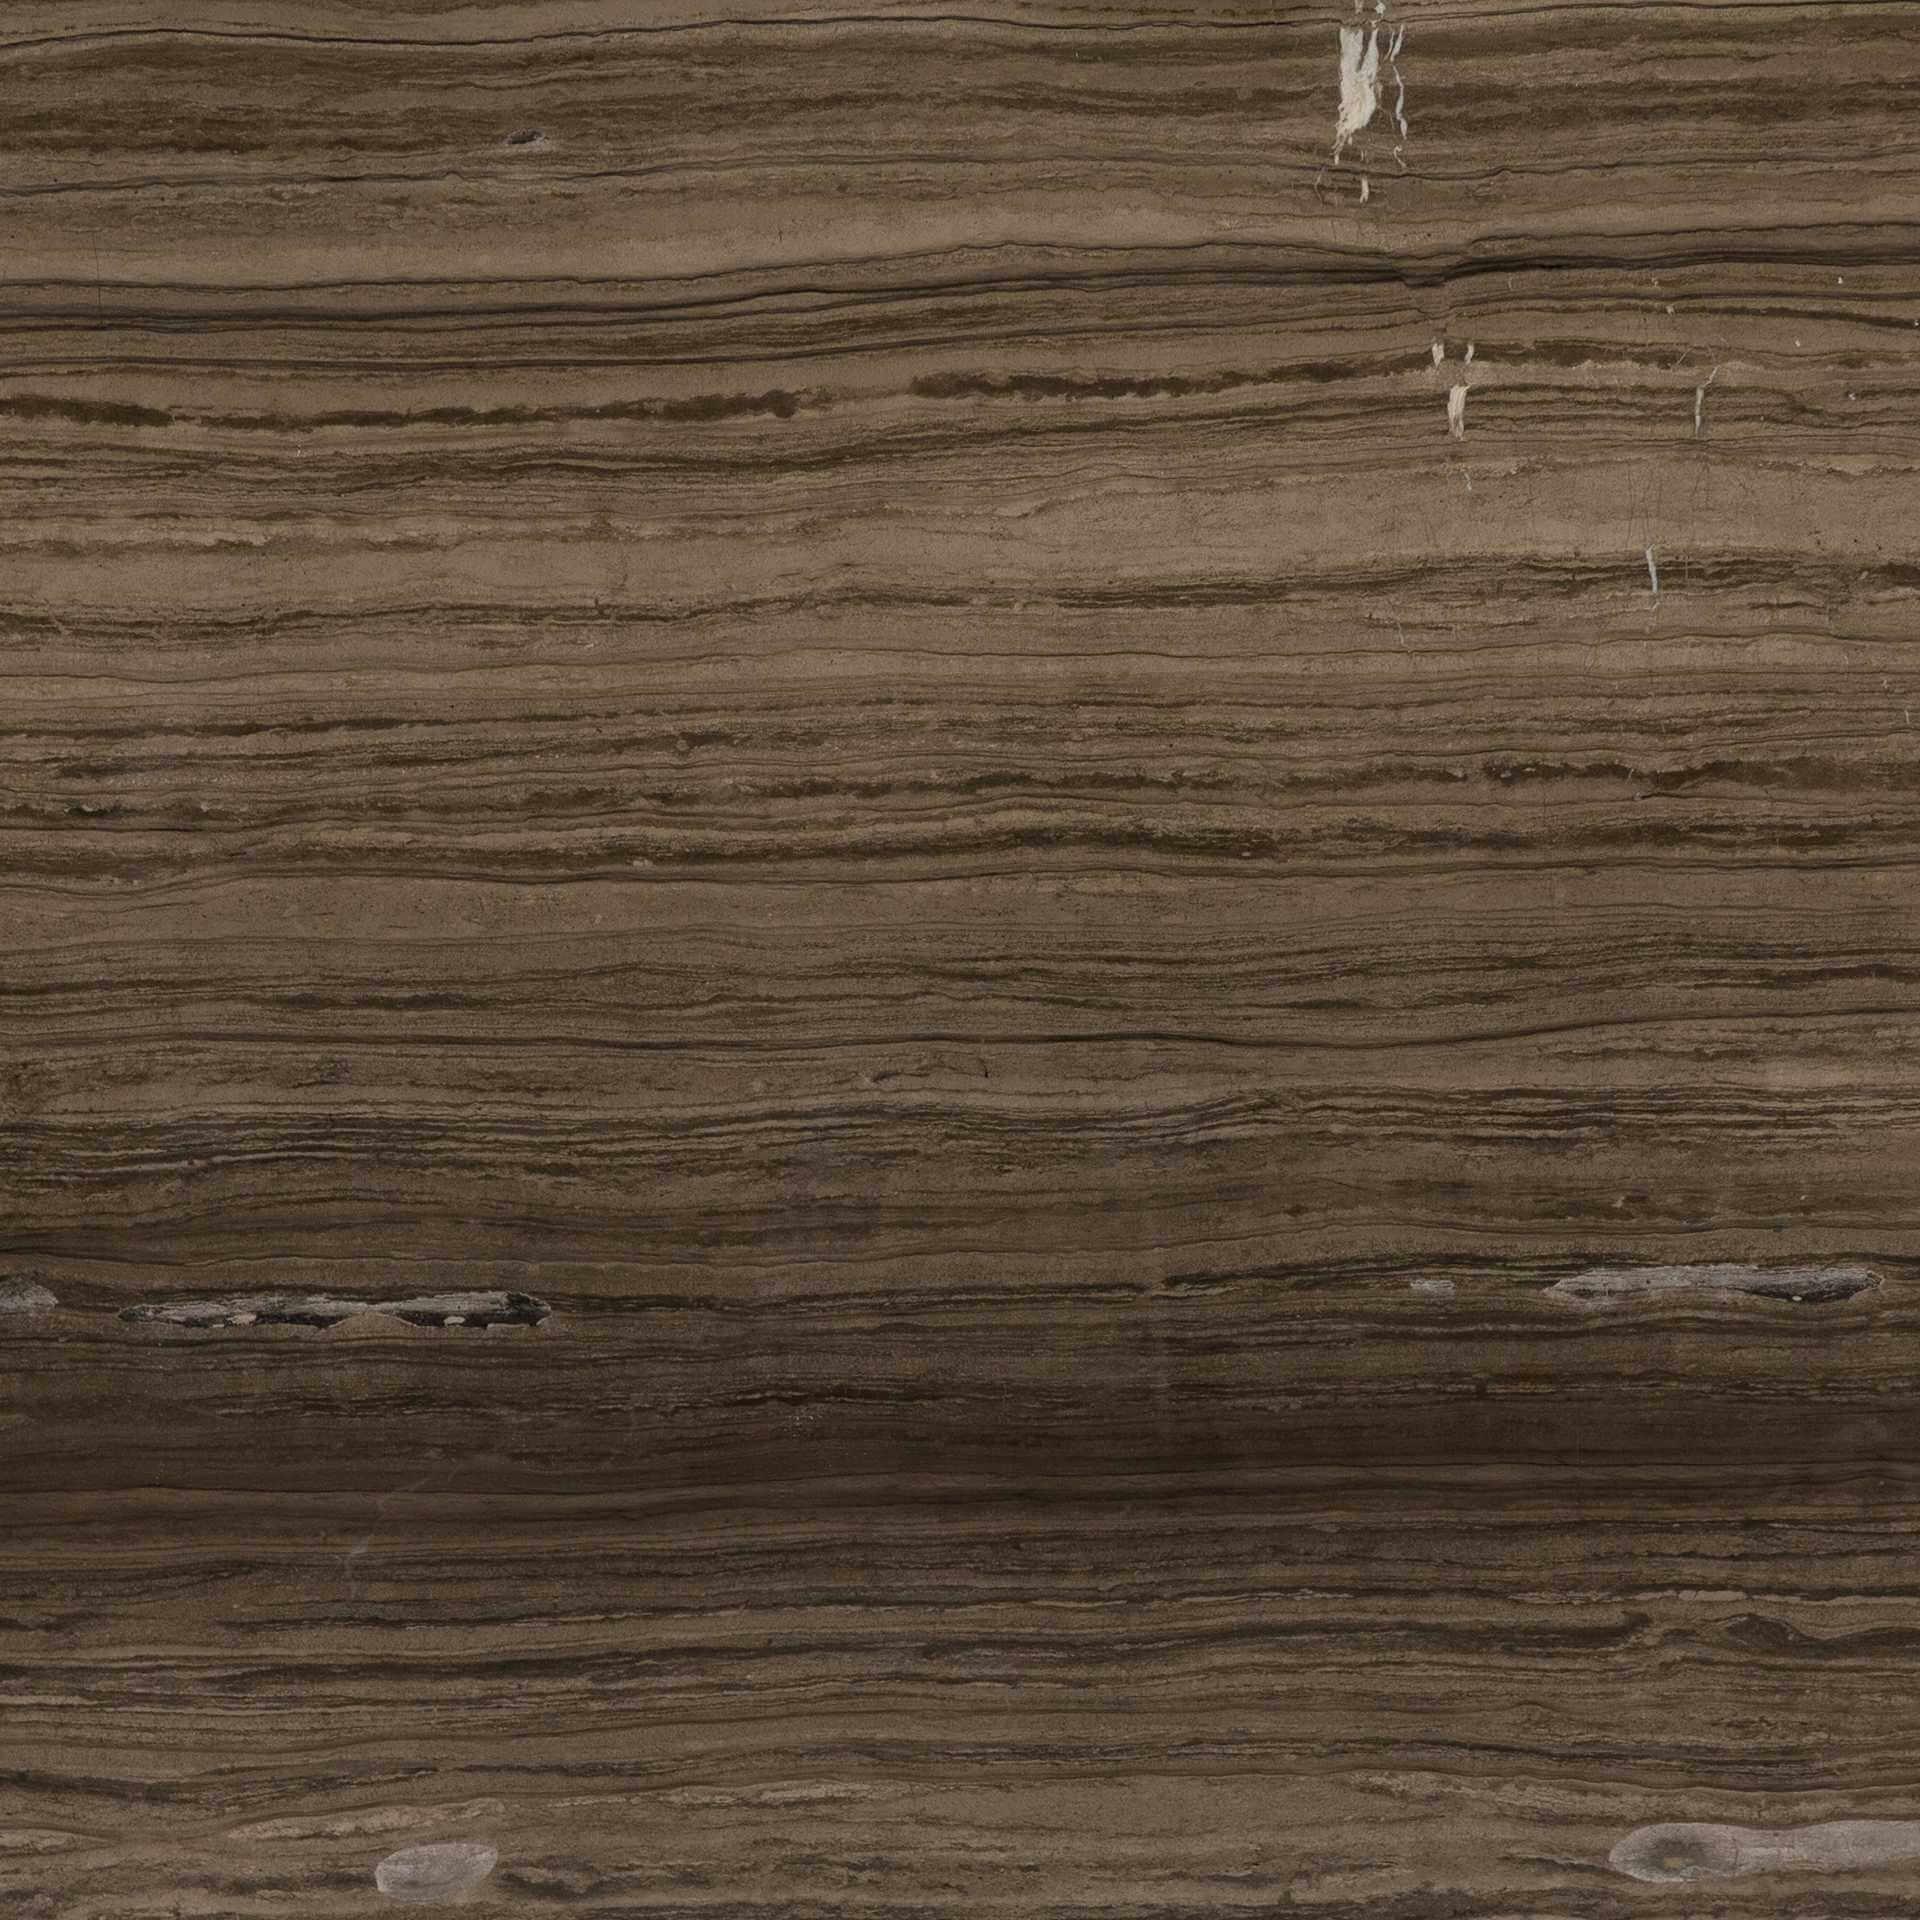 Coffee Brown Marble